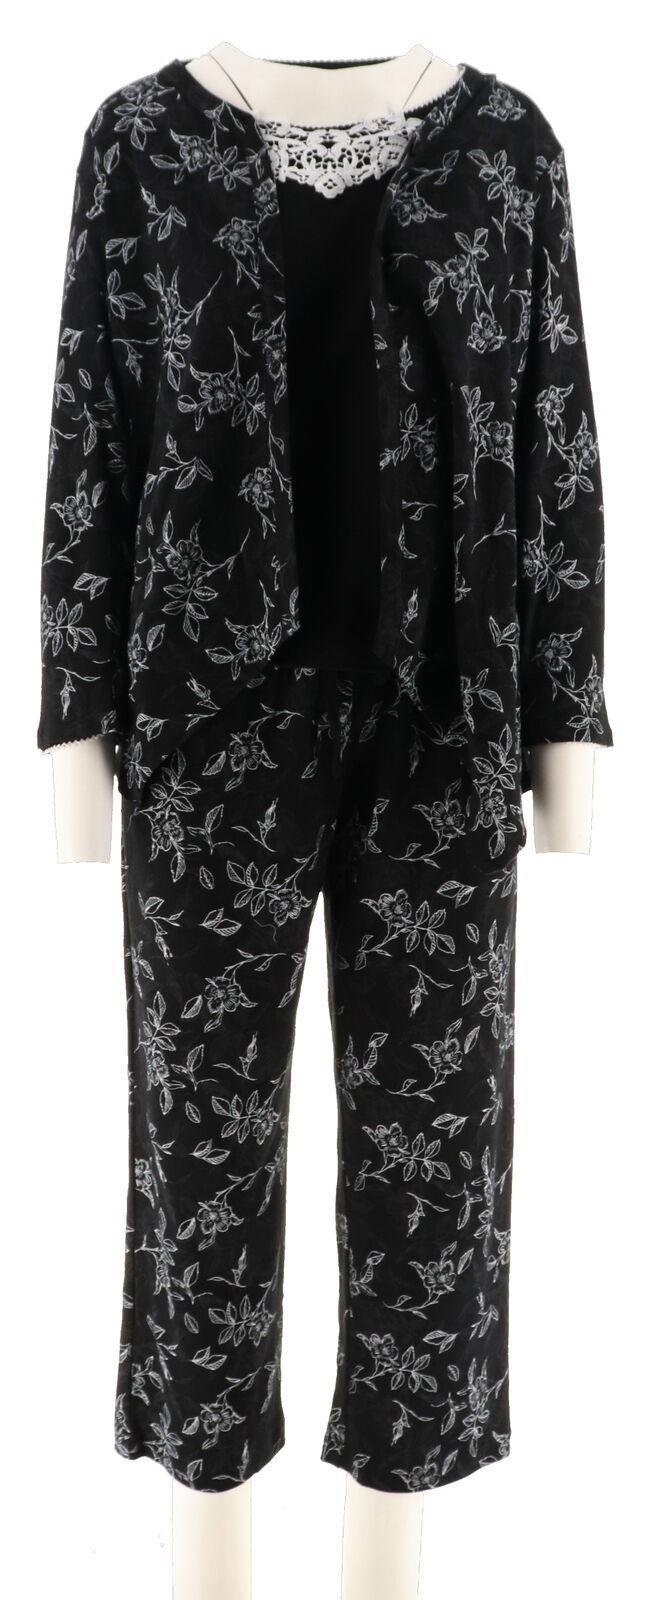 Carole Hochman Ripple Tiles Patio Pant 3-Pc PJ Set Black 3X NEW A302164